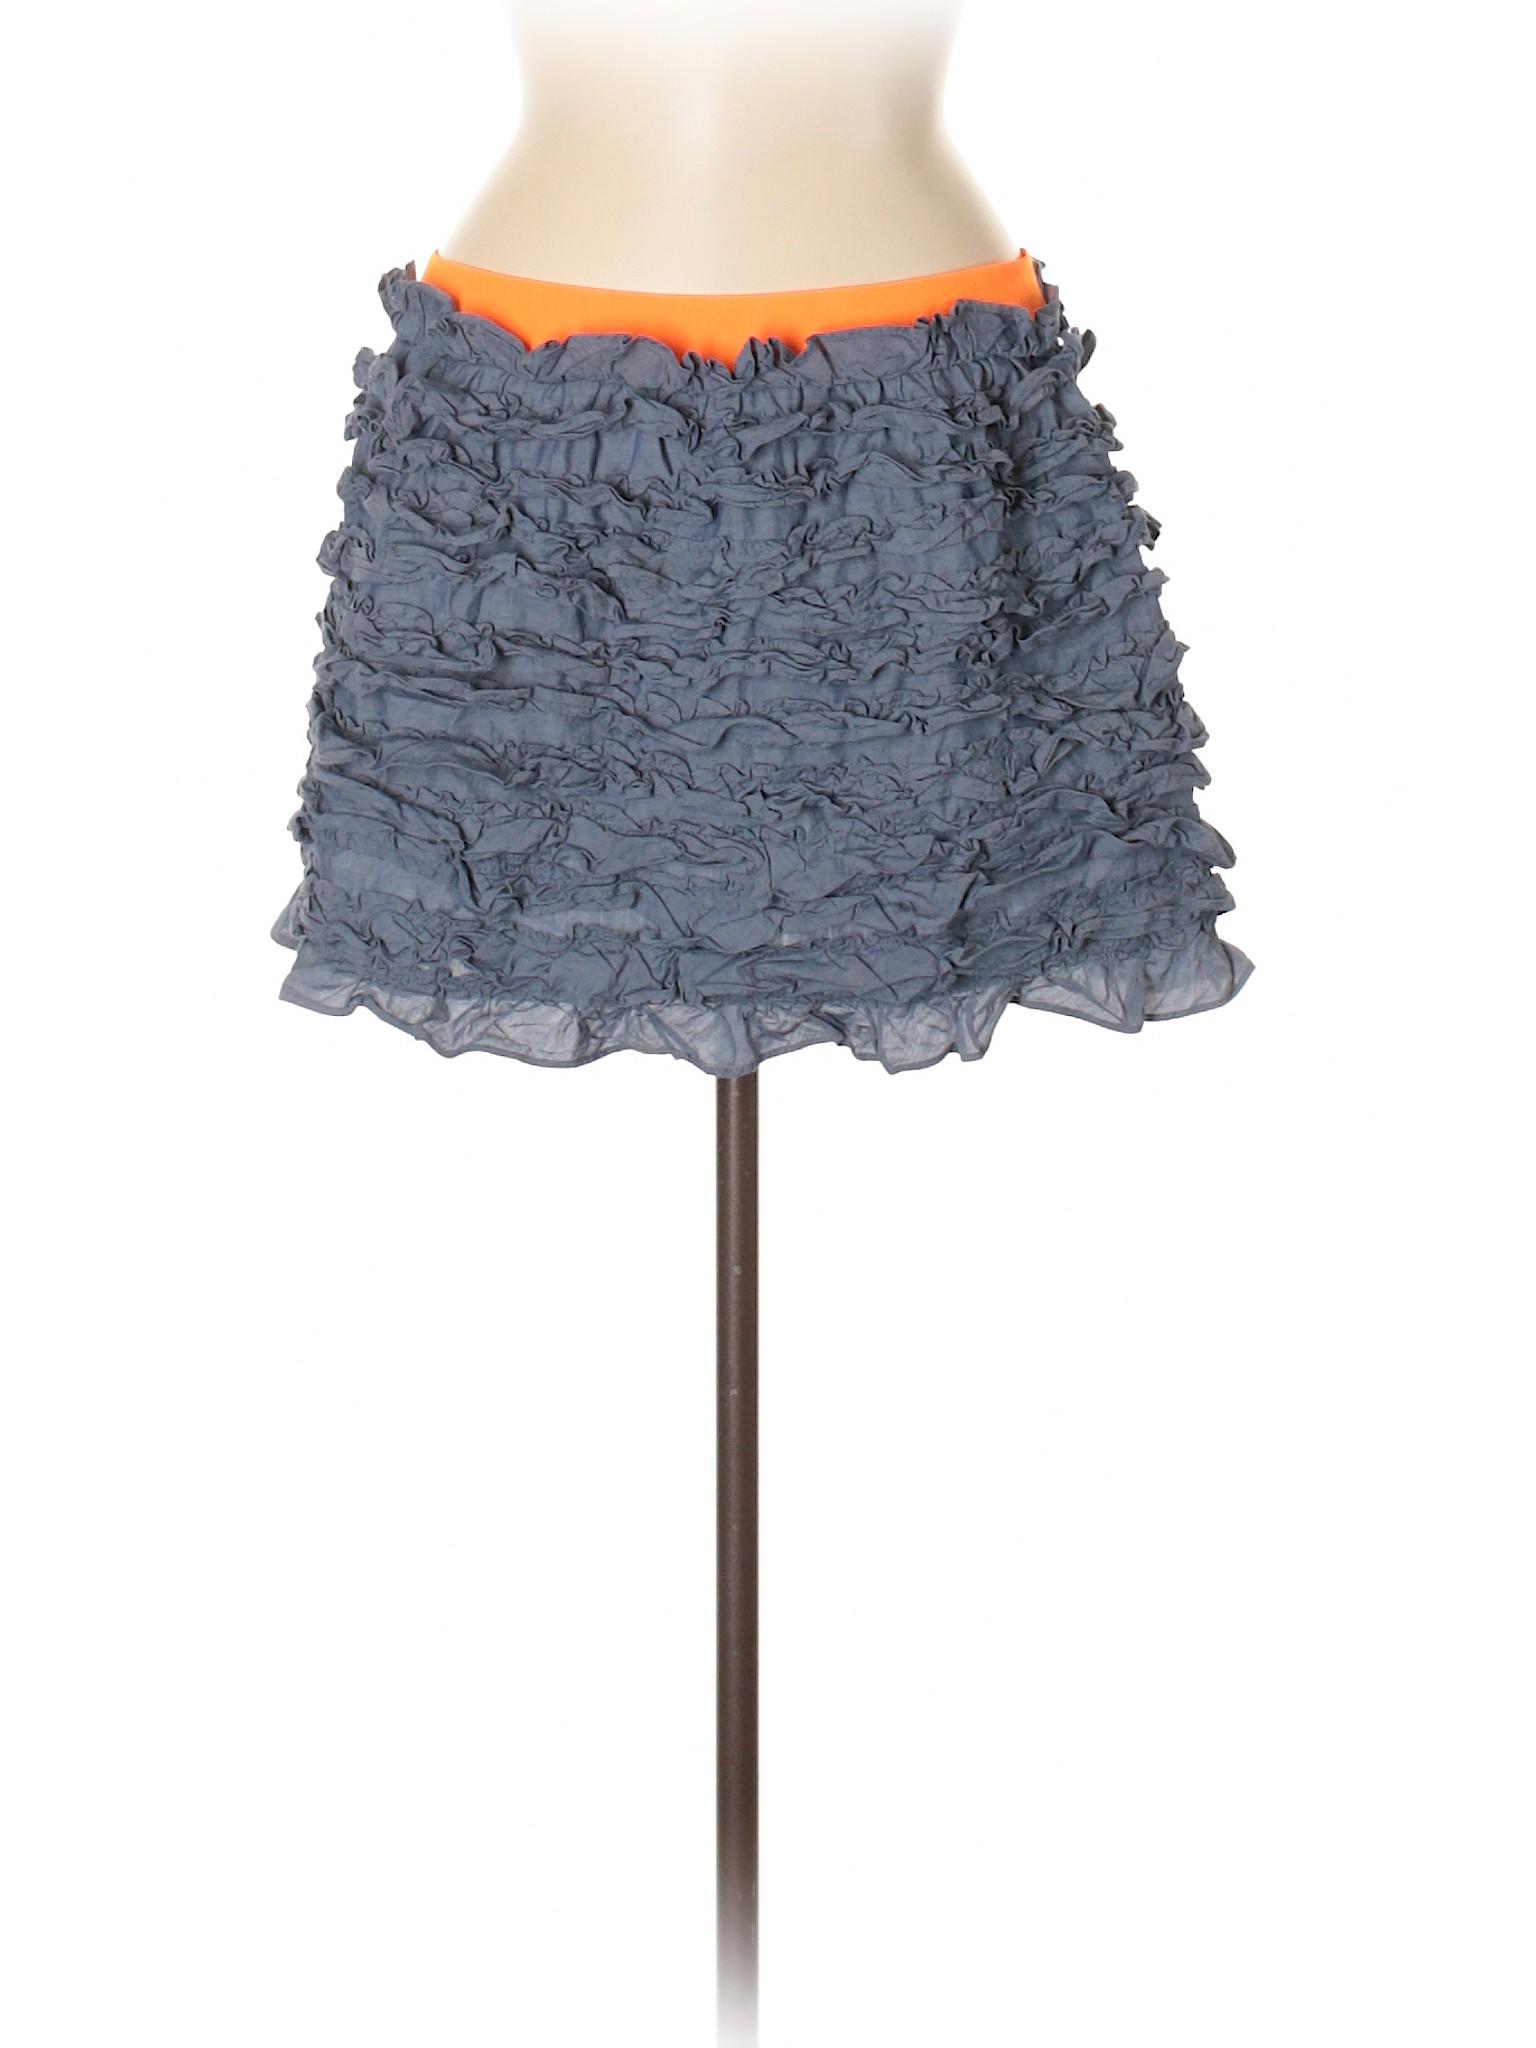 Boutique Casual Skirt Boutique Boutique Boutique Boutique Casual Skirt Skirt Skirt Casual Casual Ag1w1zZq